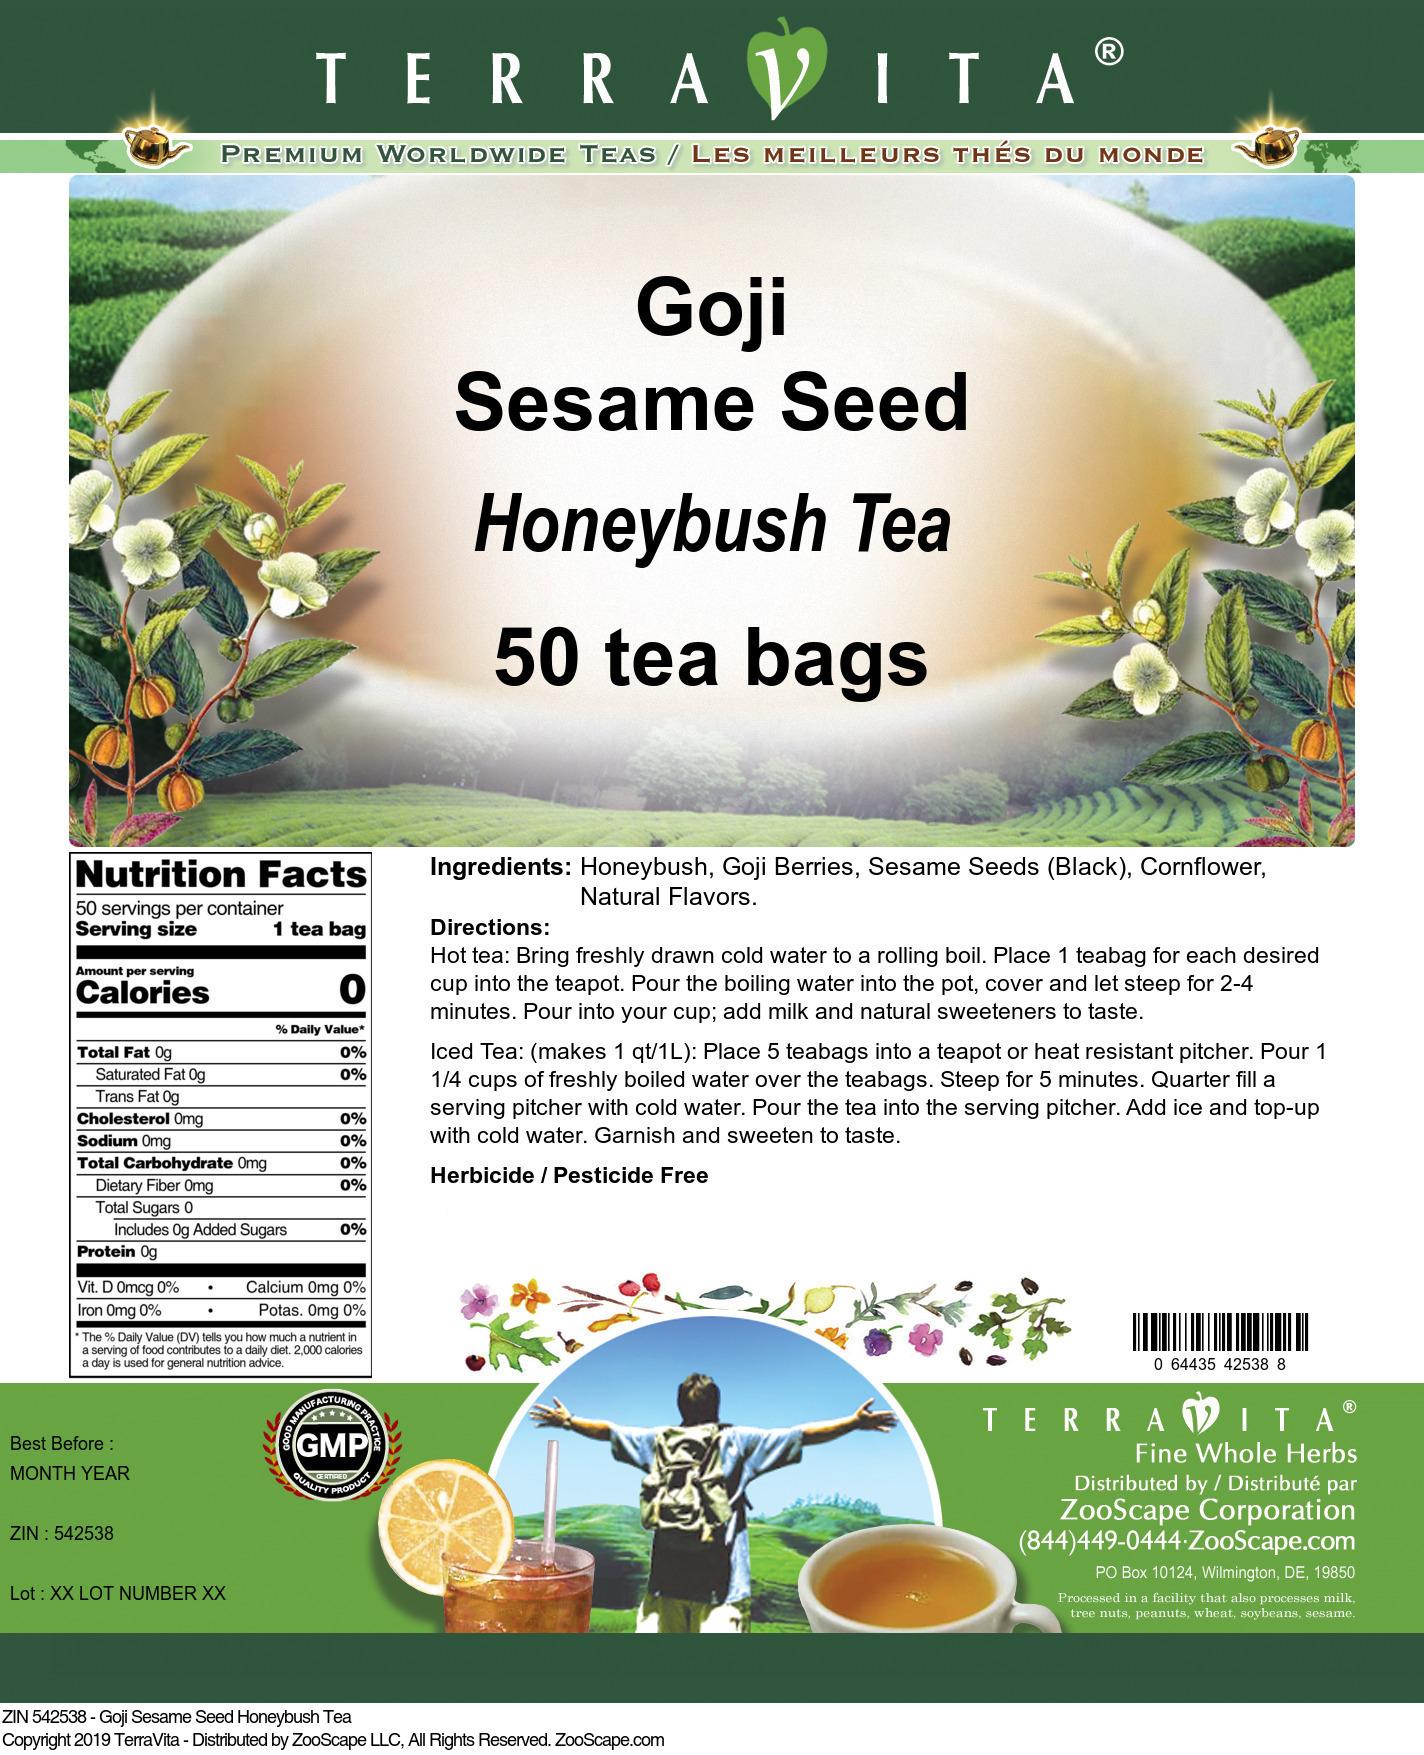 Goji Sesame Seed Honeybush Tea